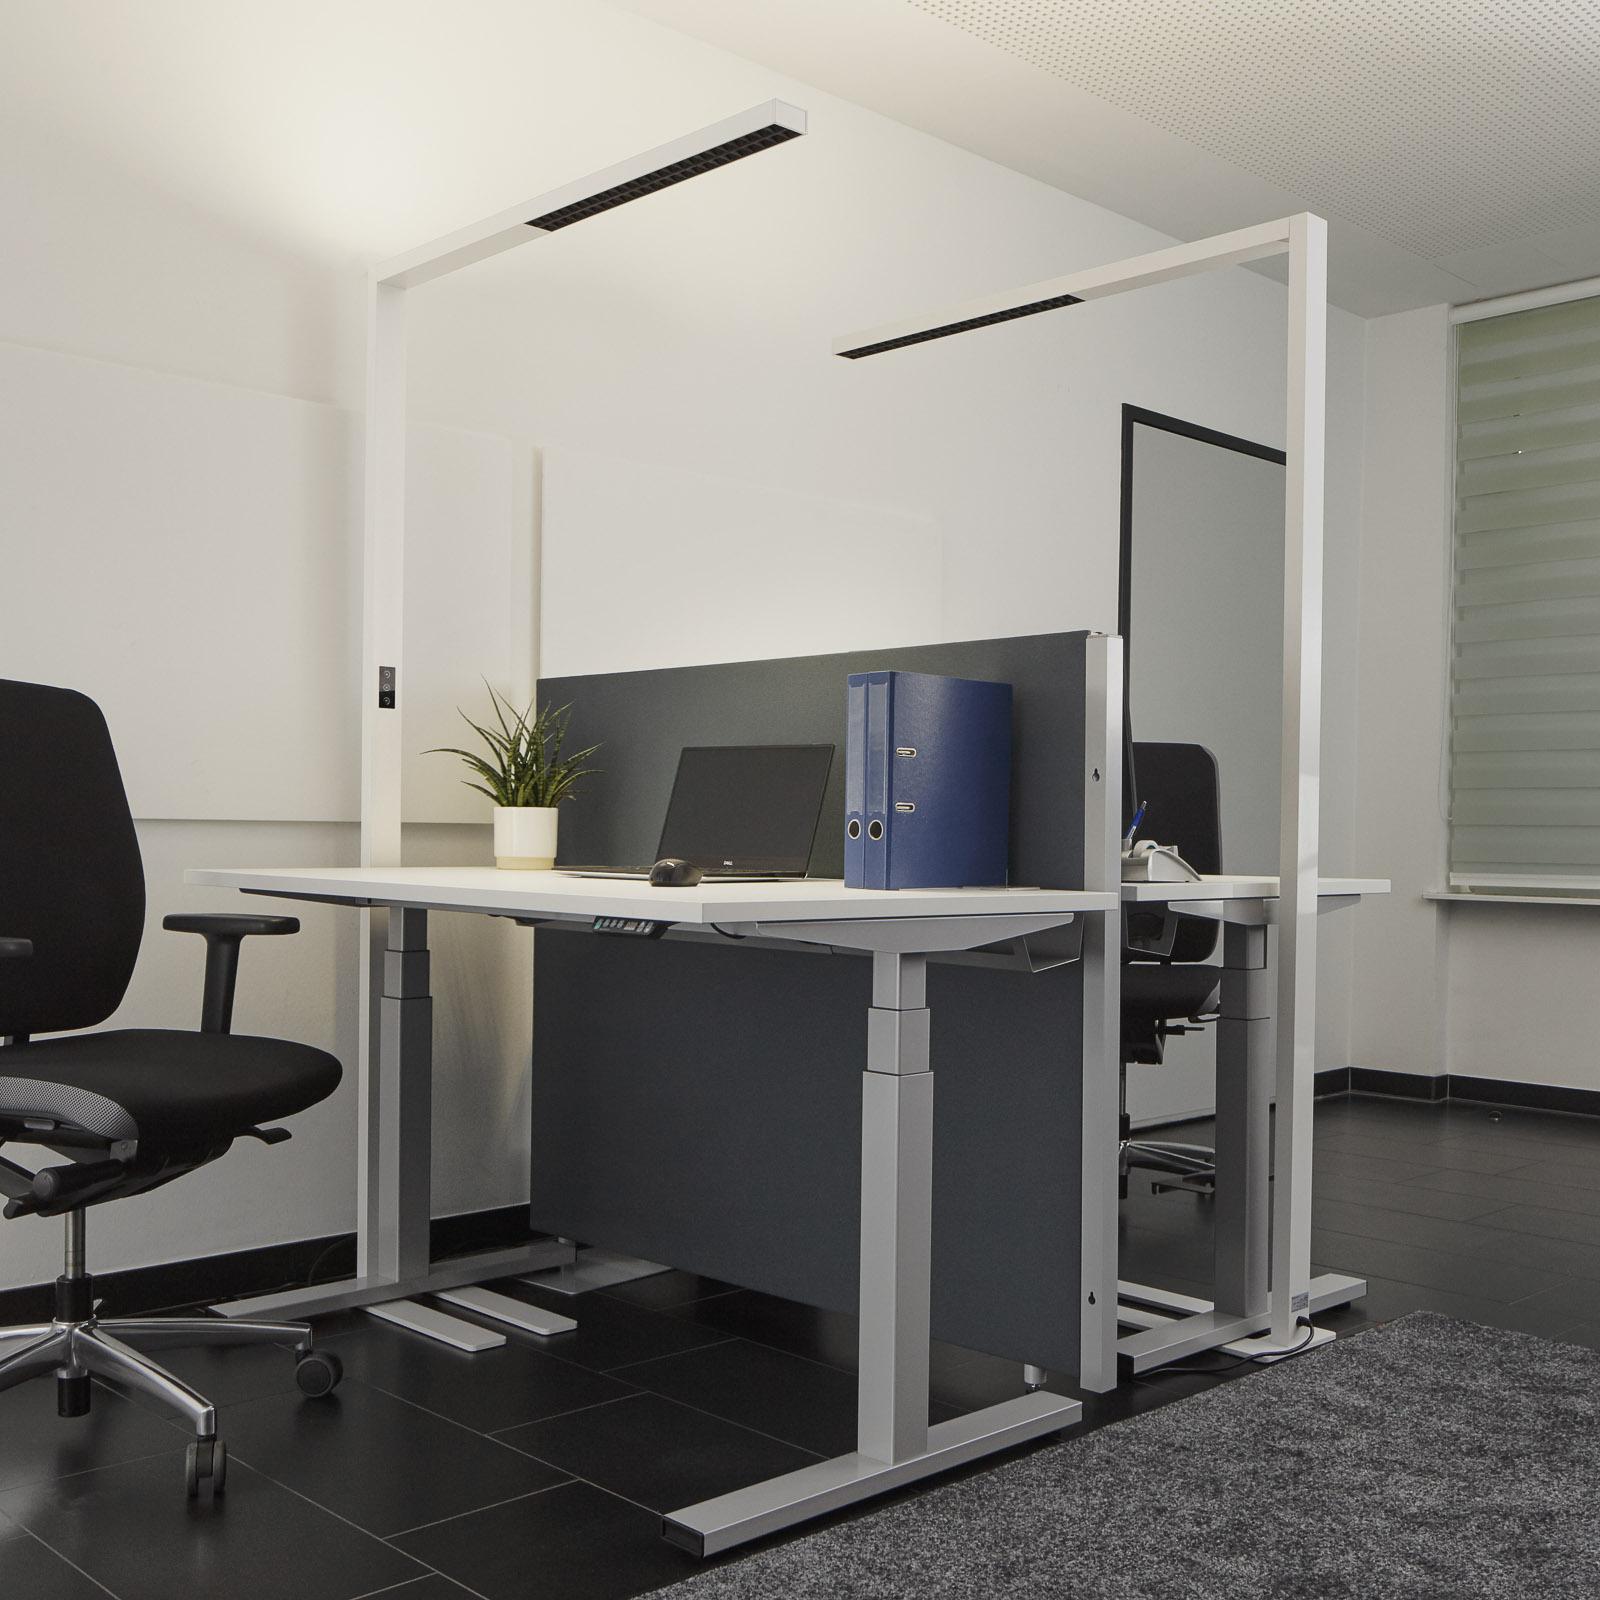 Lampadaire Office LED blanc Jolinda, dimmable